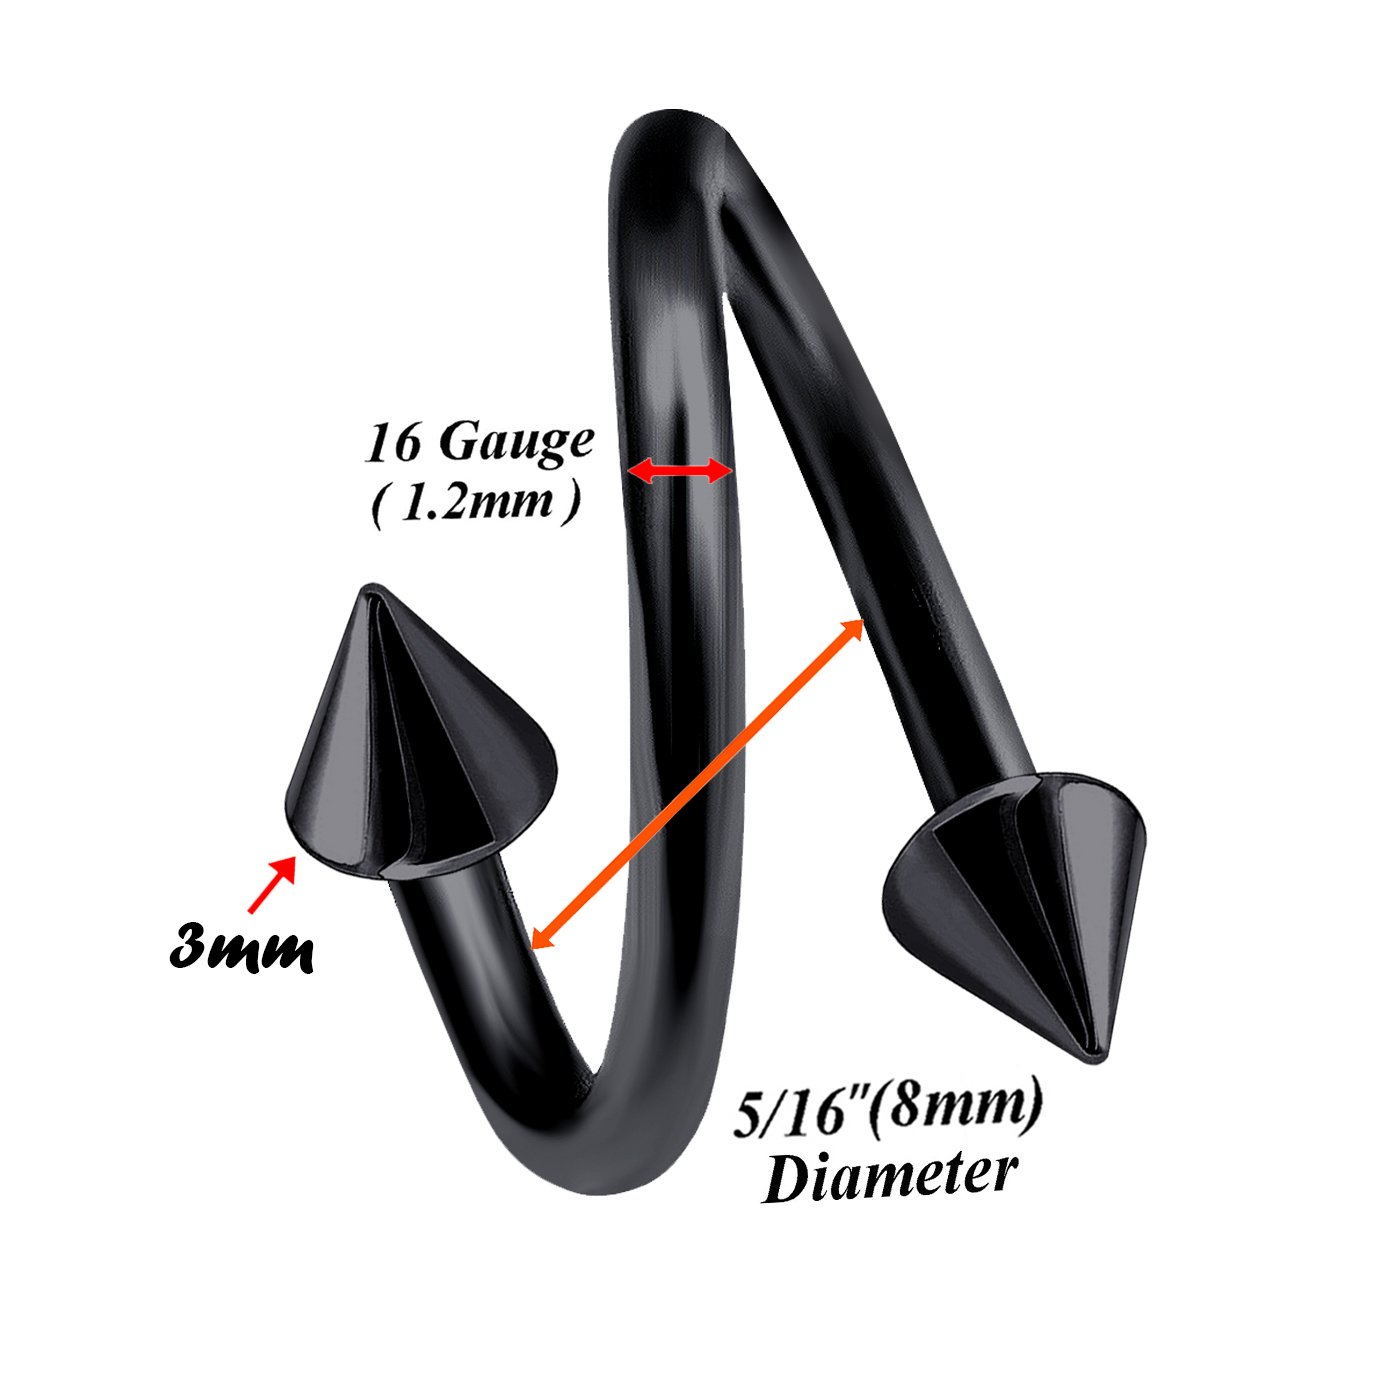 bodyjewellery 2pcs 16g 8mm Spiral Barbell Titanium Eyebrow Helix Hoop Studs Bar Twisted Earring Lip Tragus Cartilage B2QCZ Pick color